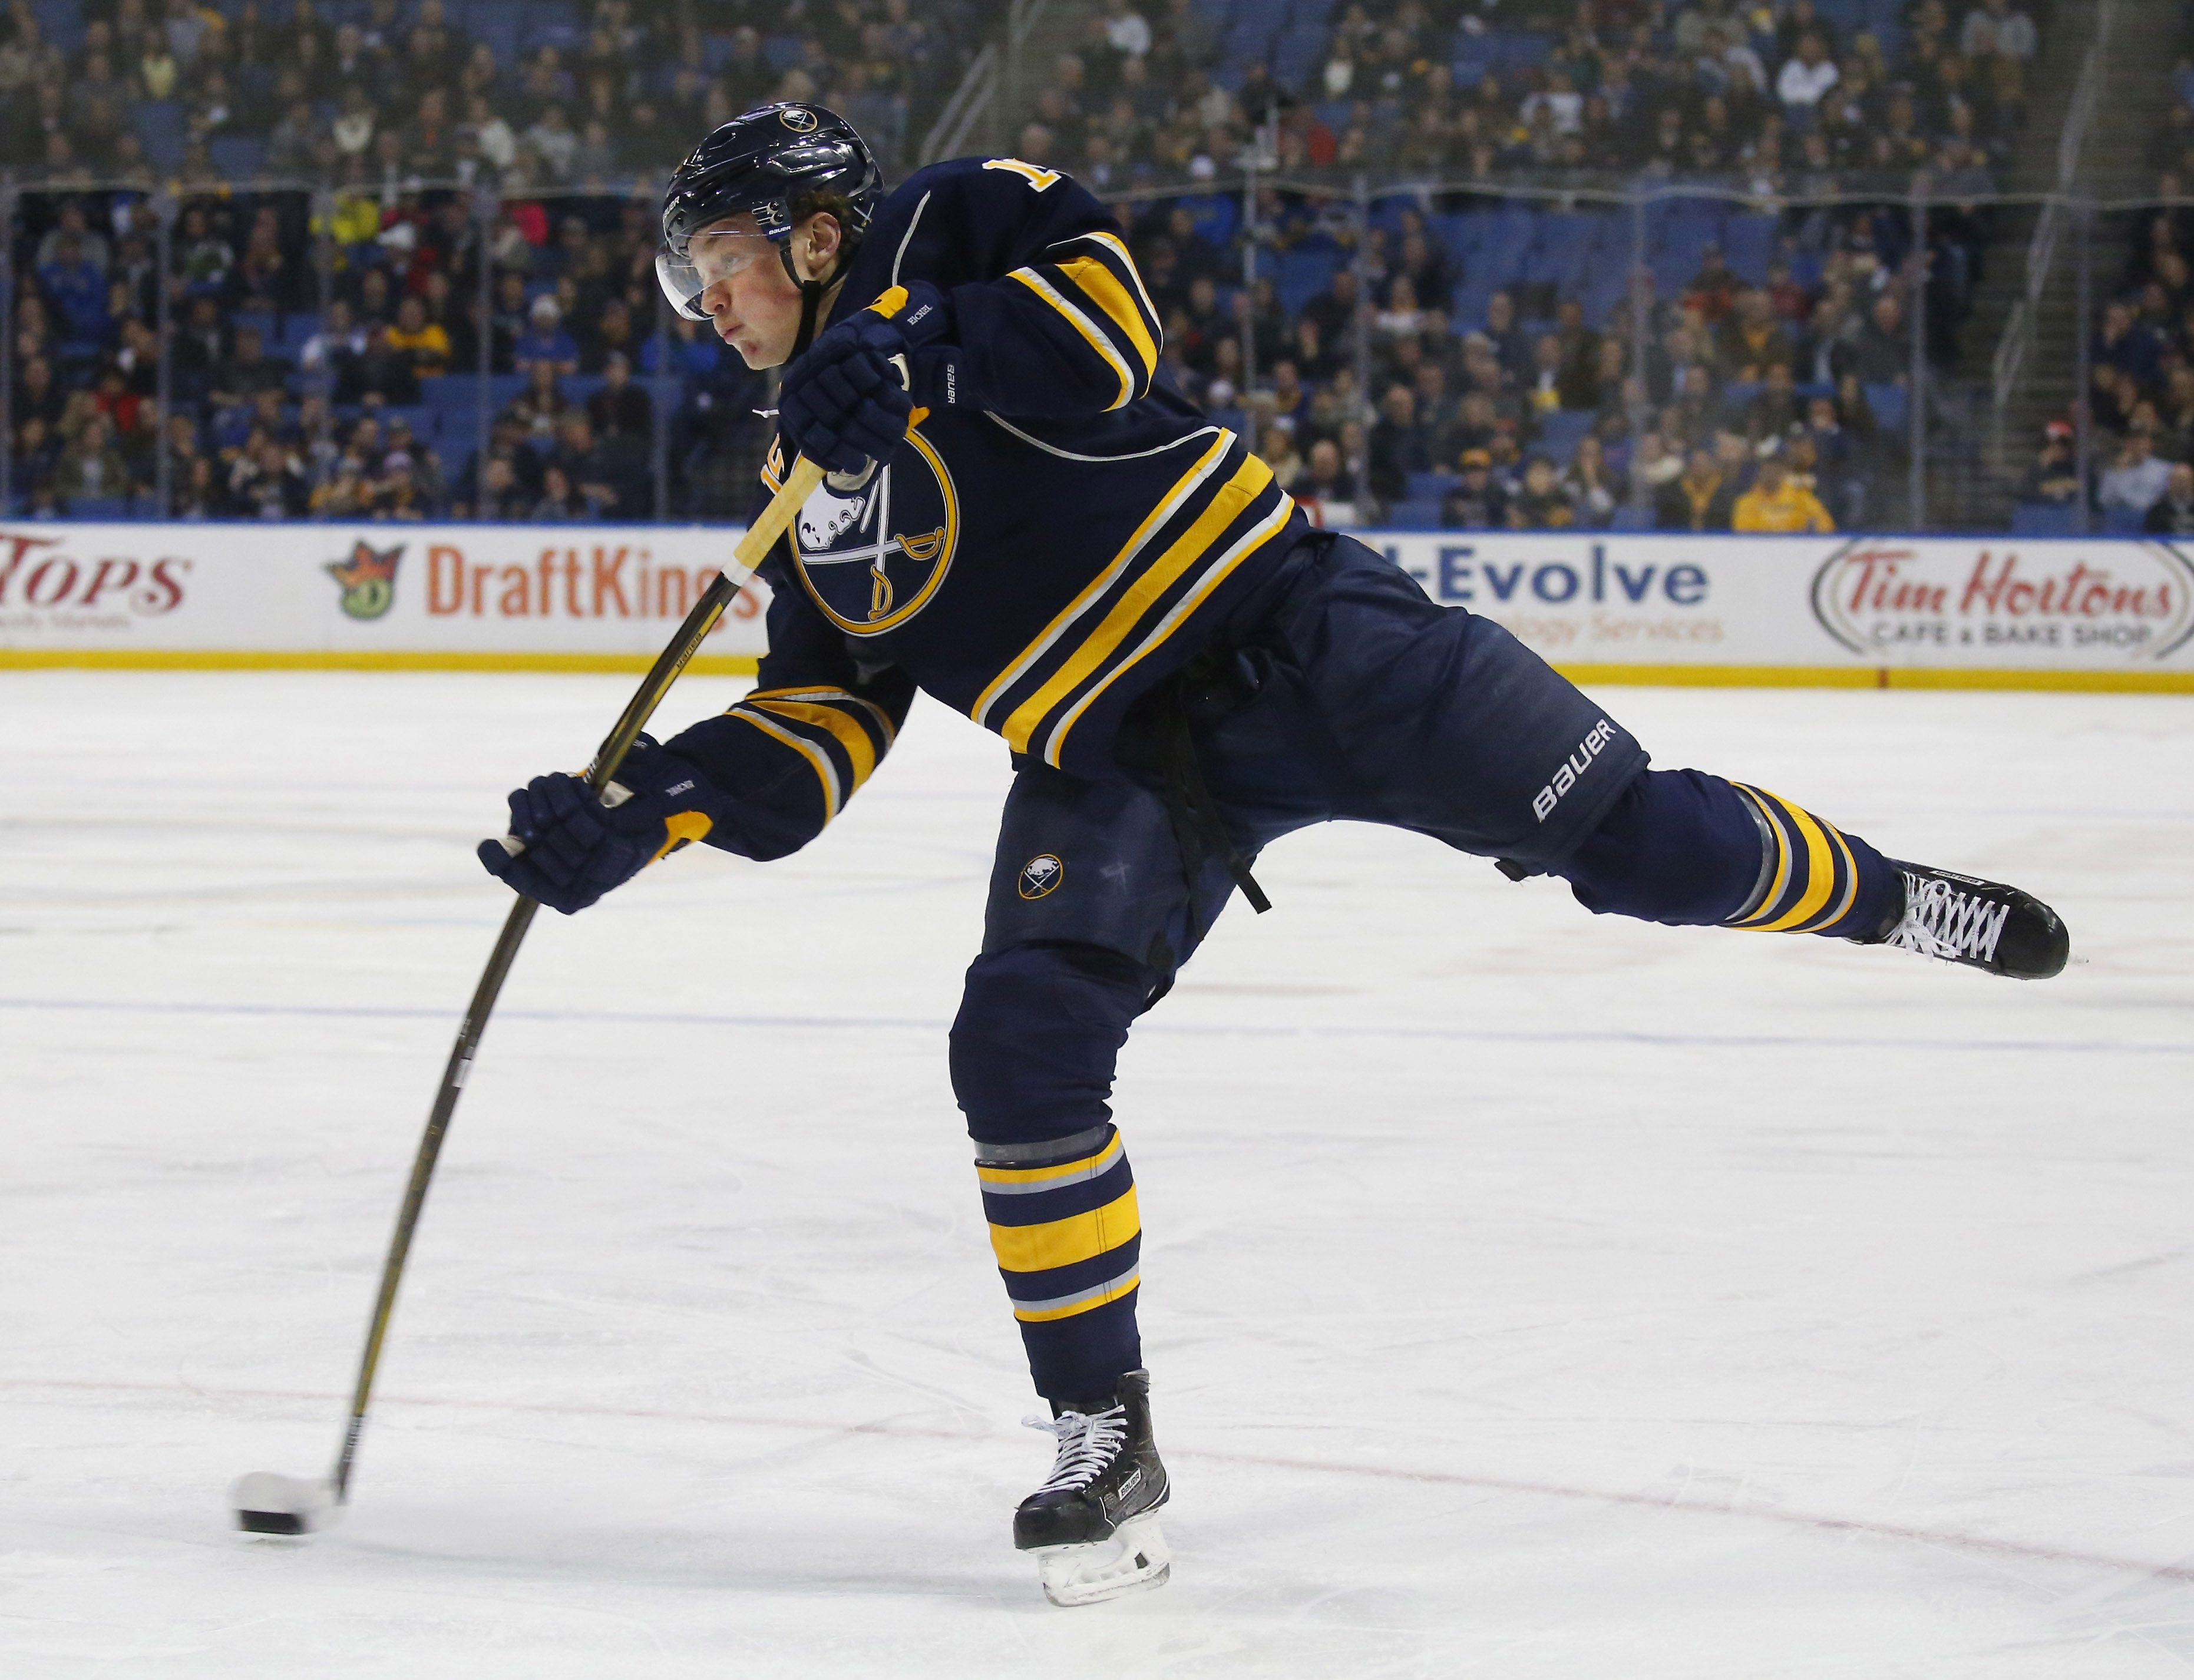 Jack Eichel rips a shot in the first period at First Niagara Center in Buffalo Monday, Nov. 23, 2015.  (Mark Mulville/Buffalo News)